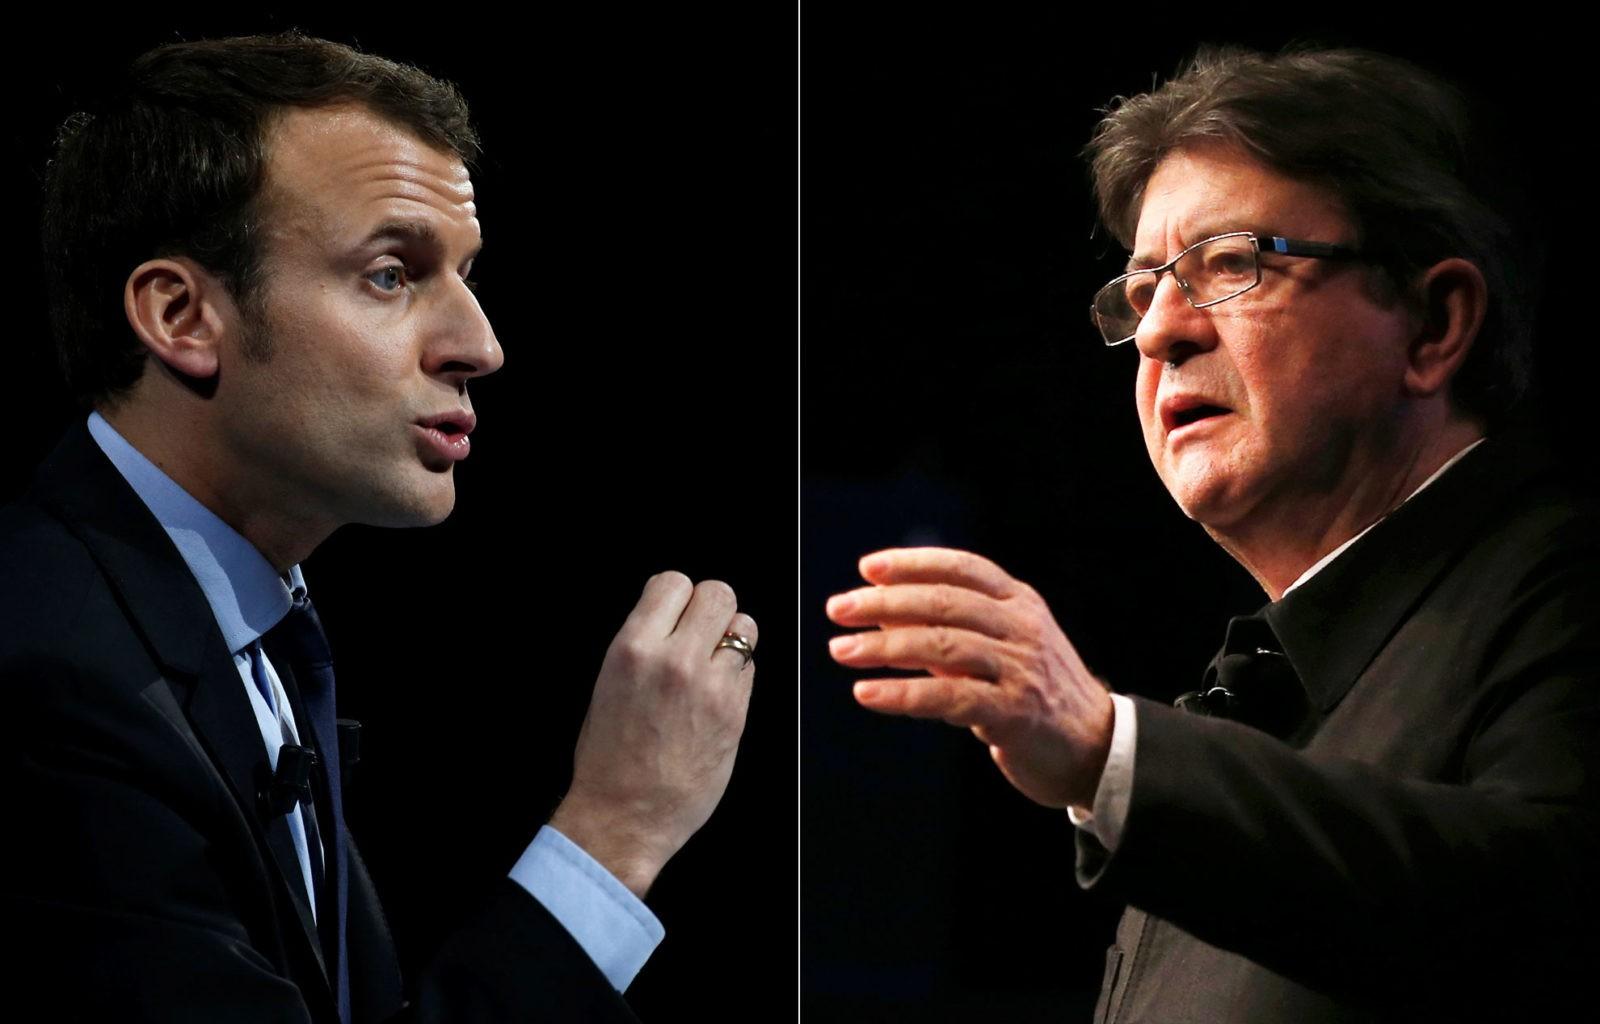 VIDEO. Zap Culture #4 – Mélenchon vs Macron, Jordi Savall, Martin Scorsese, Renaud…